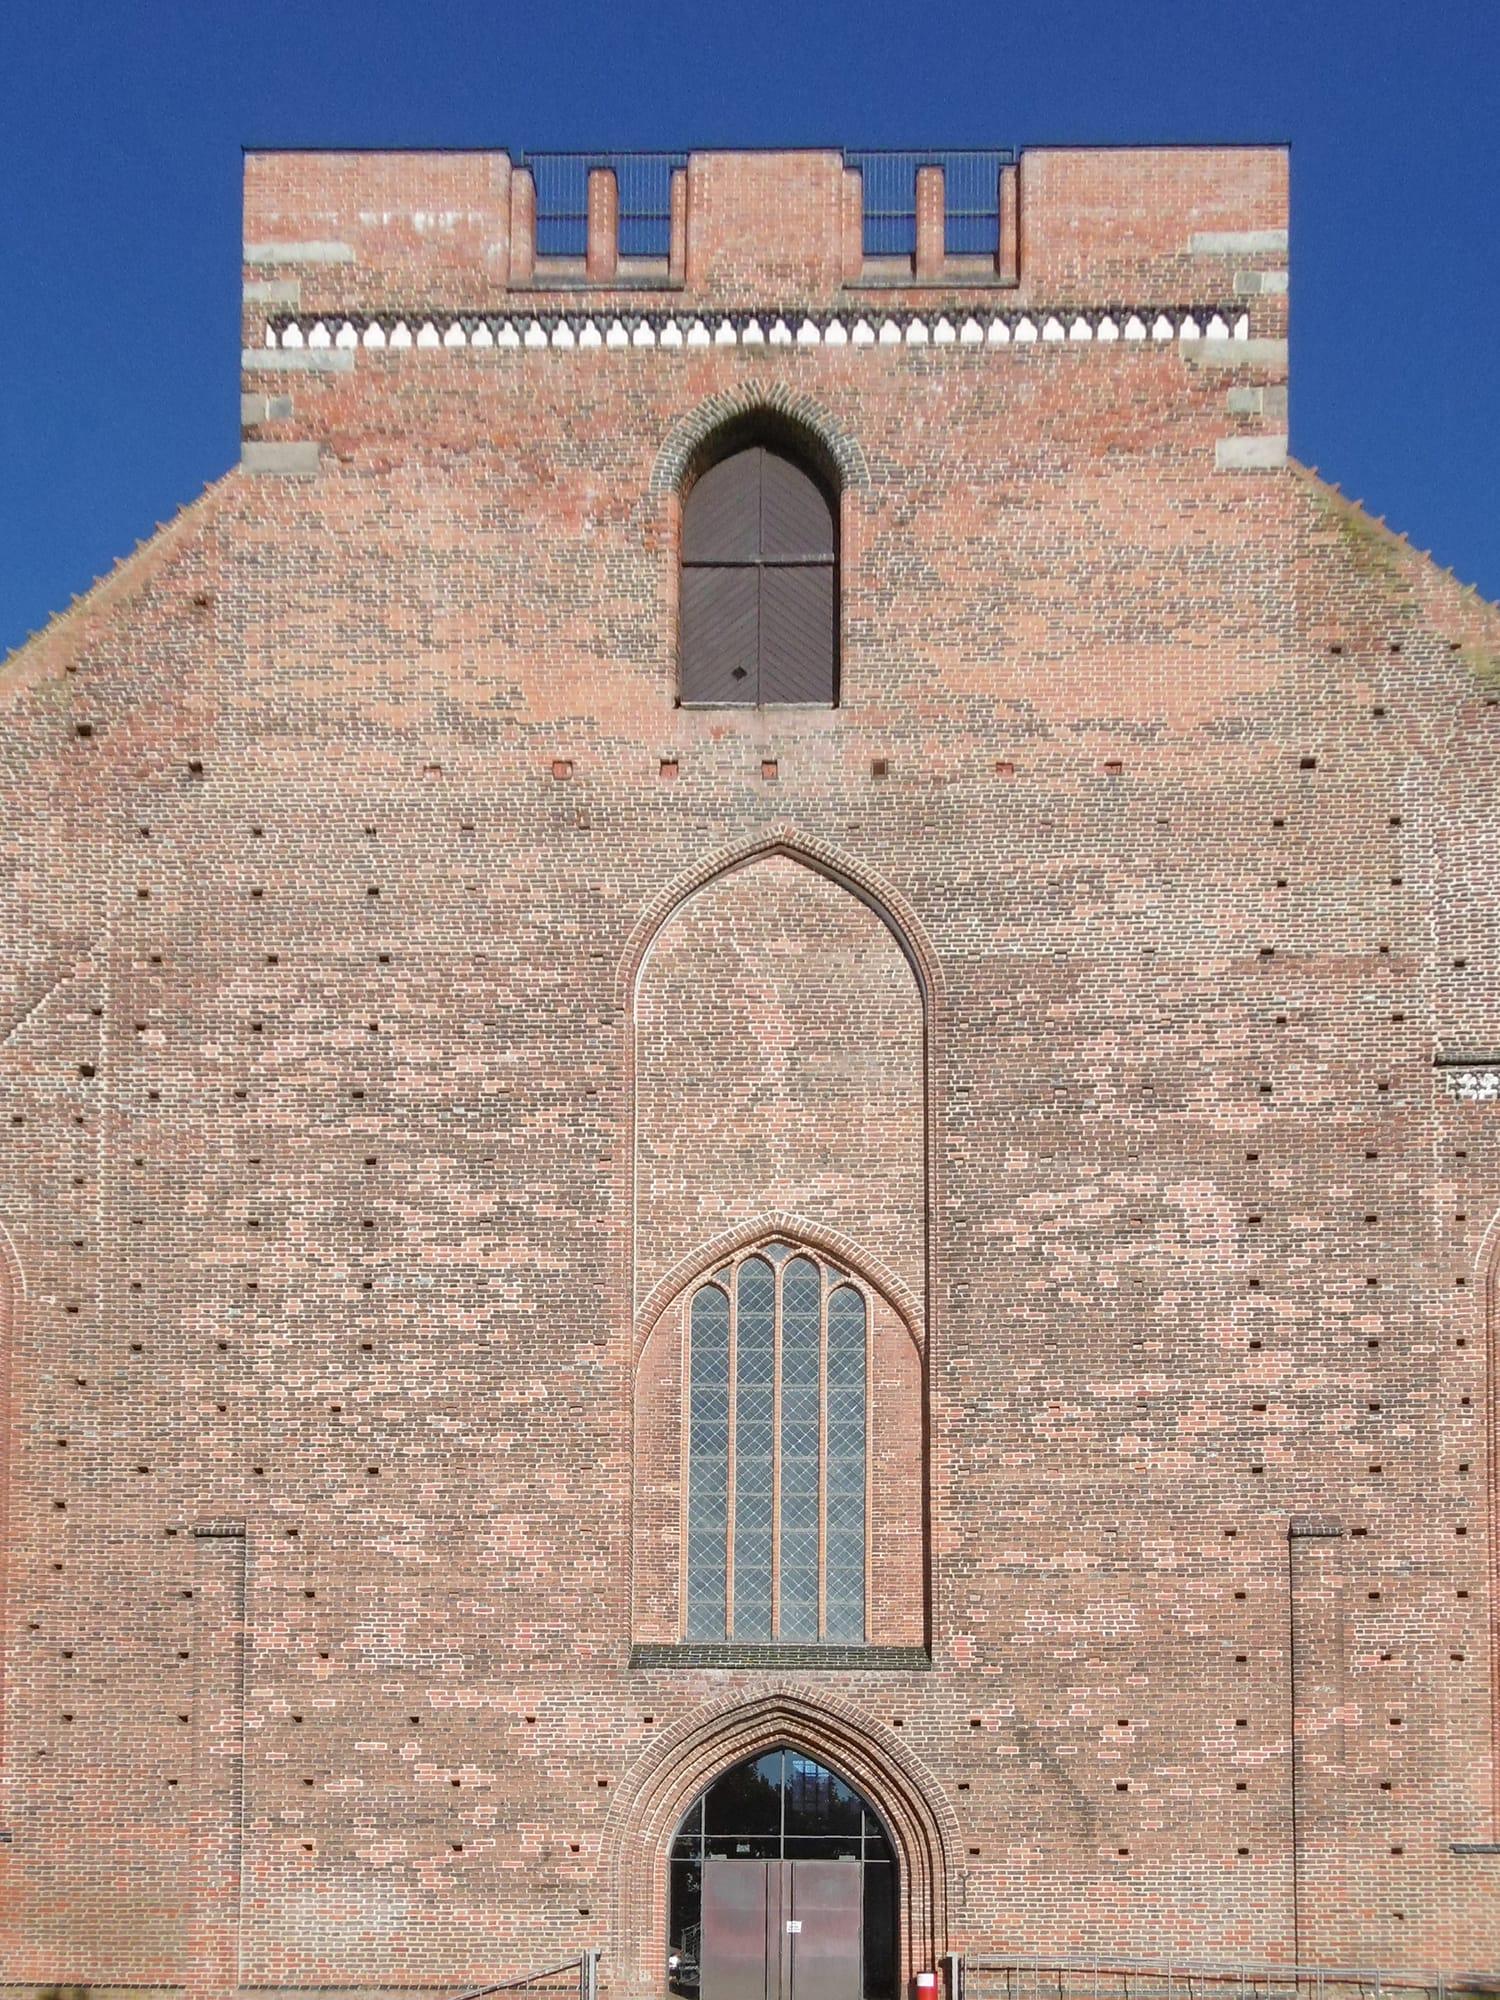 Kulturkirche Wismar - Front